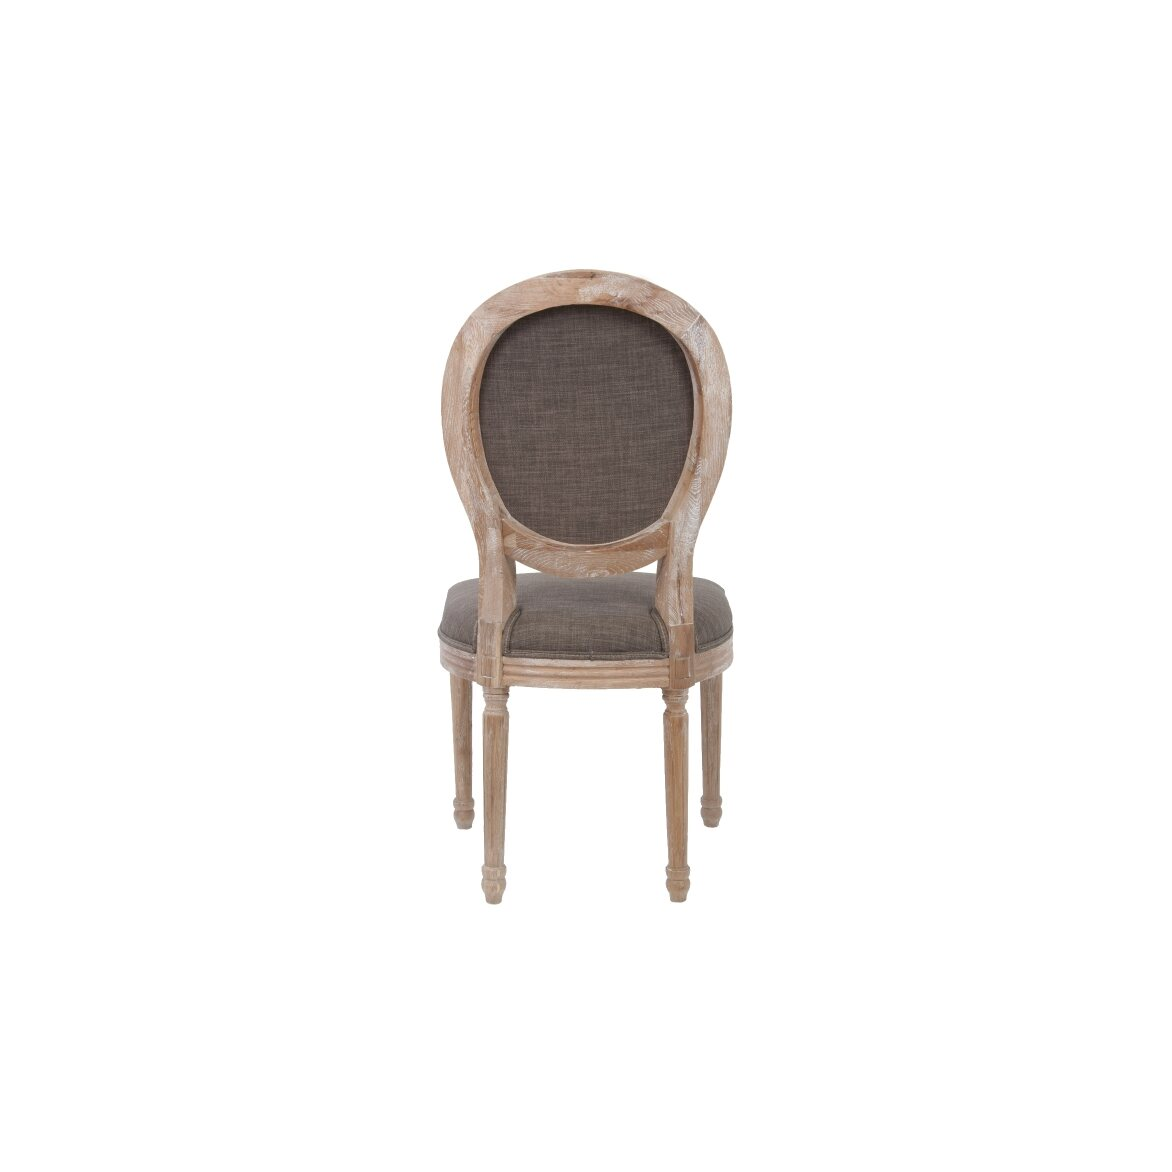 Стул Miro brown 3 | Обеденные стулья Kingsby